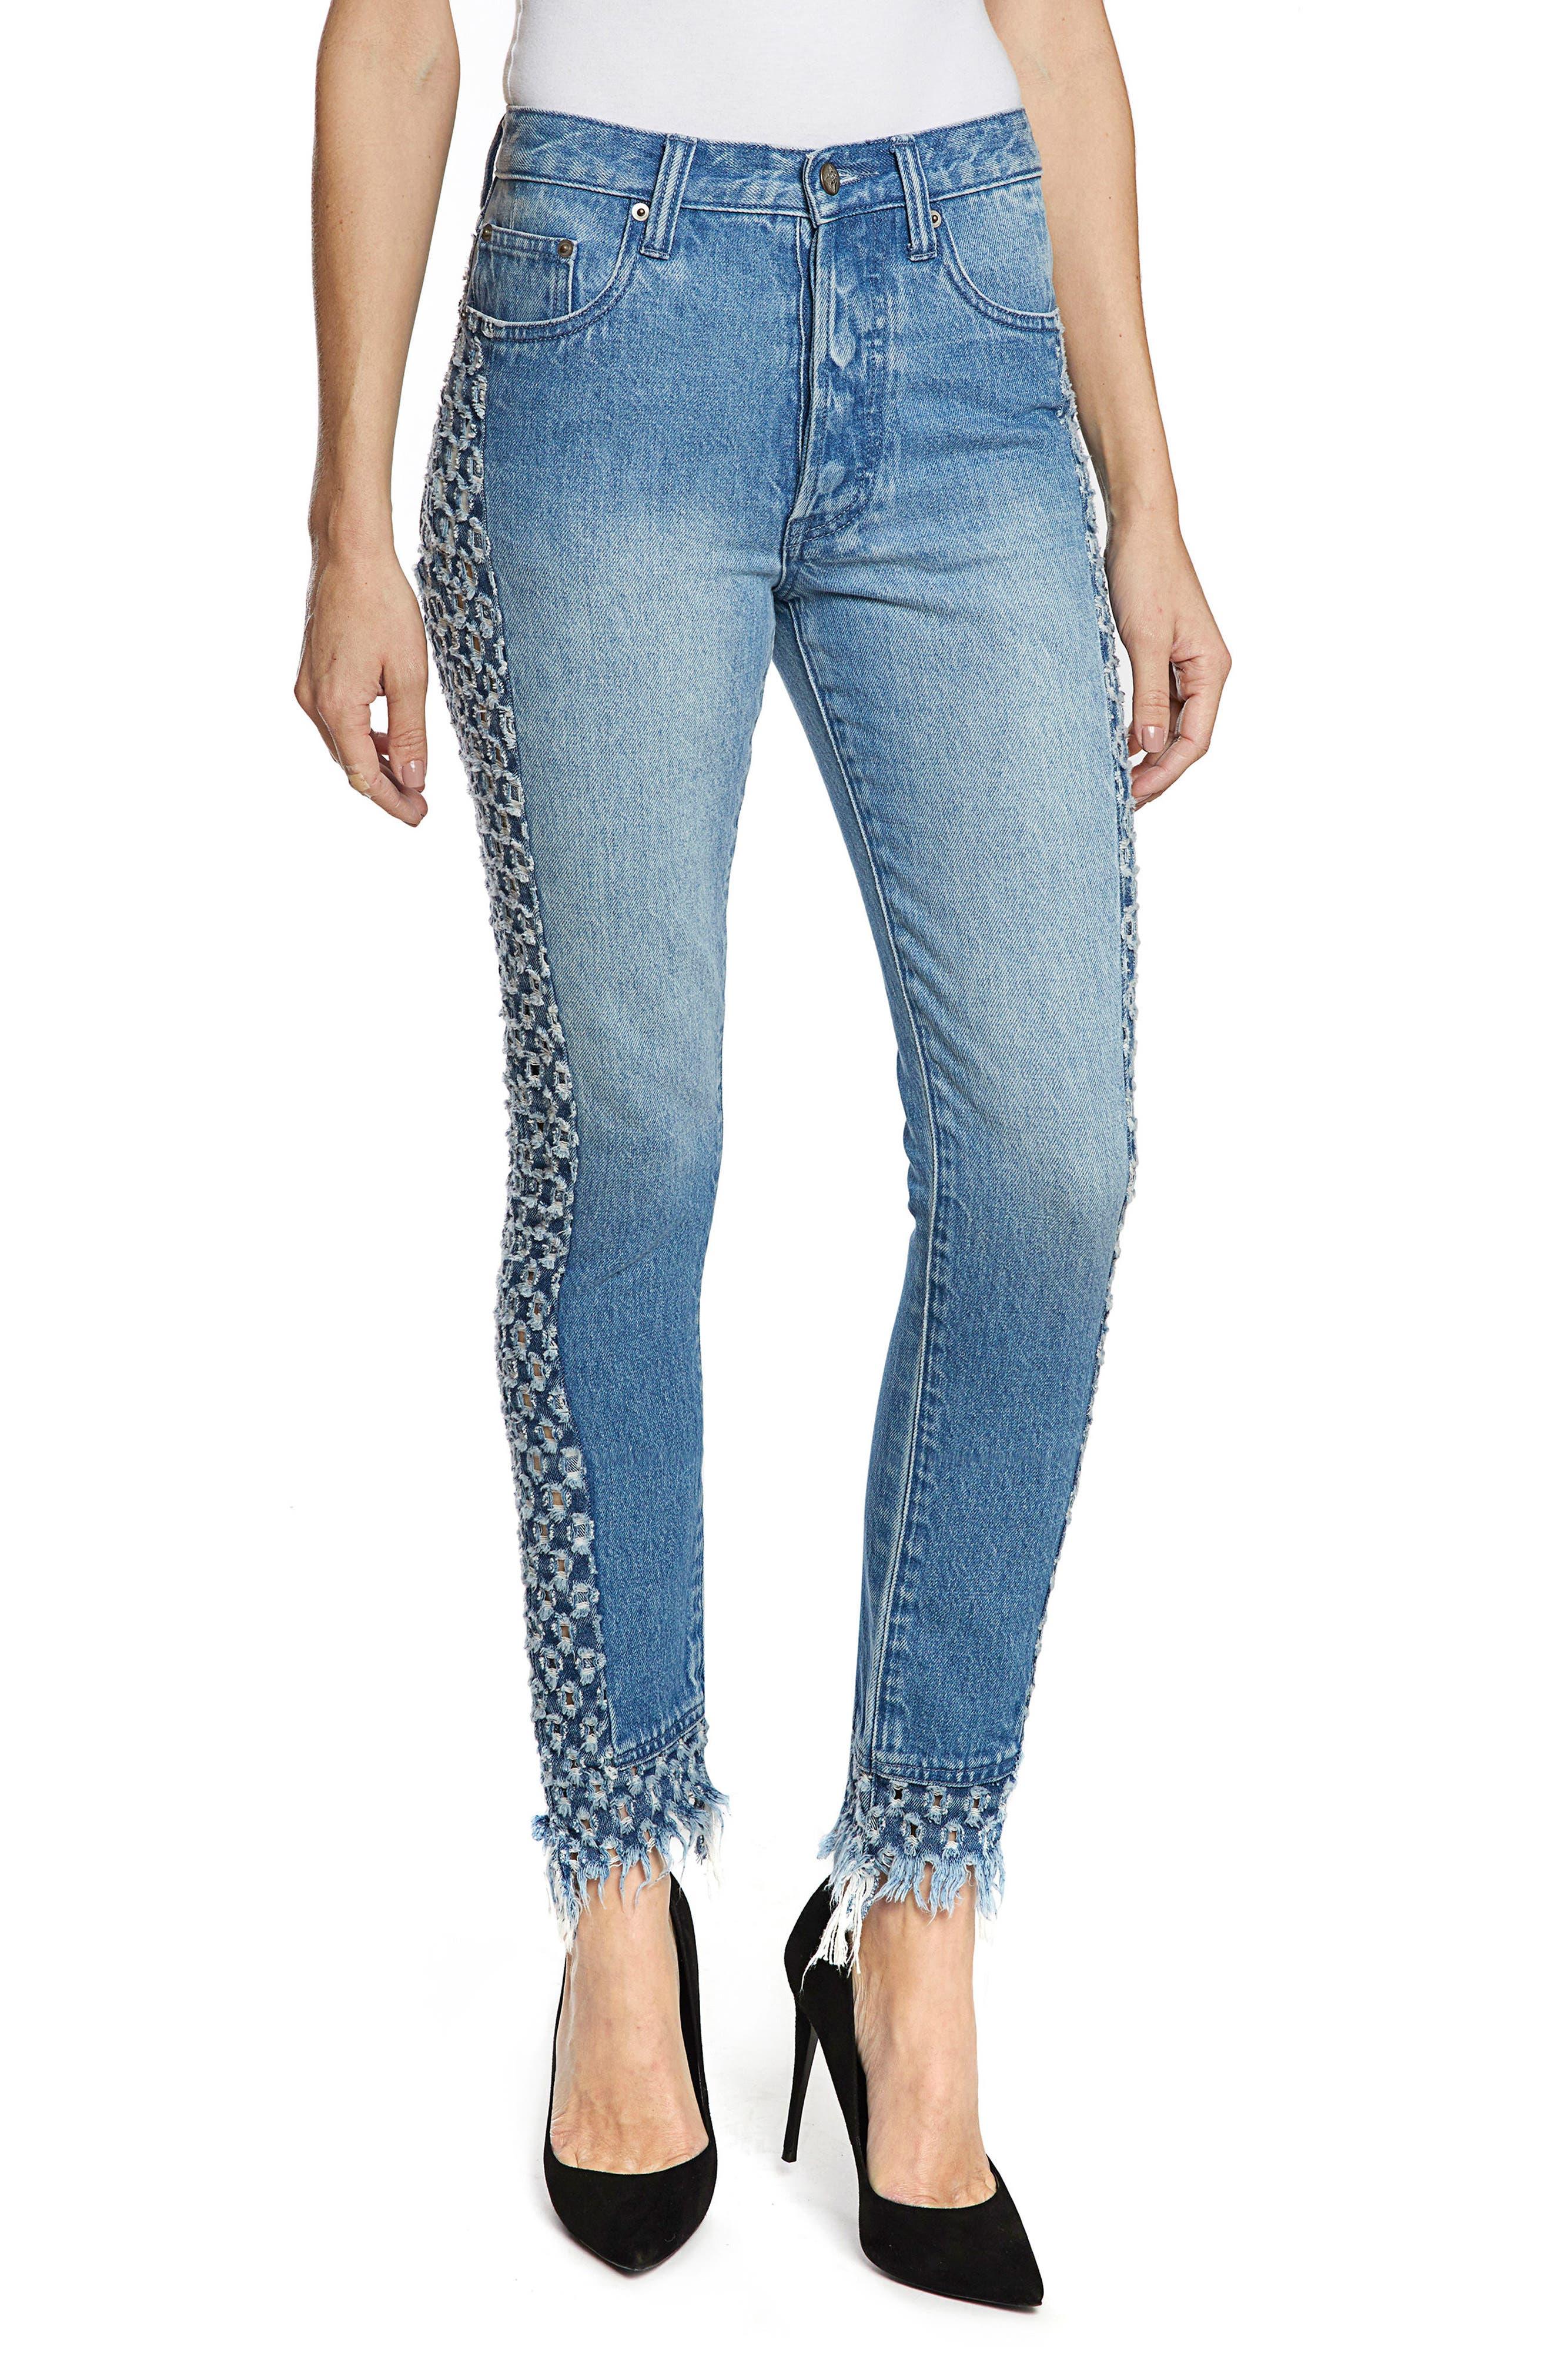 AMX Cutout Side Fray Hem Ankle Jeans,                         Main,                         color, LIGHT STONE